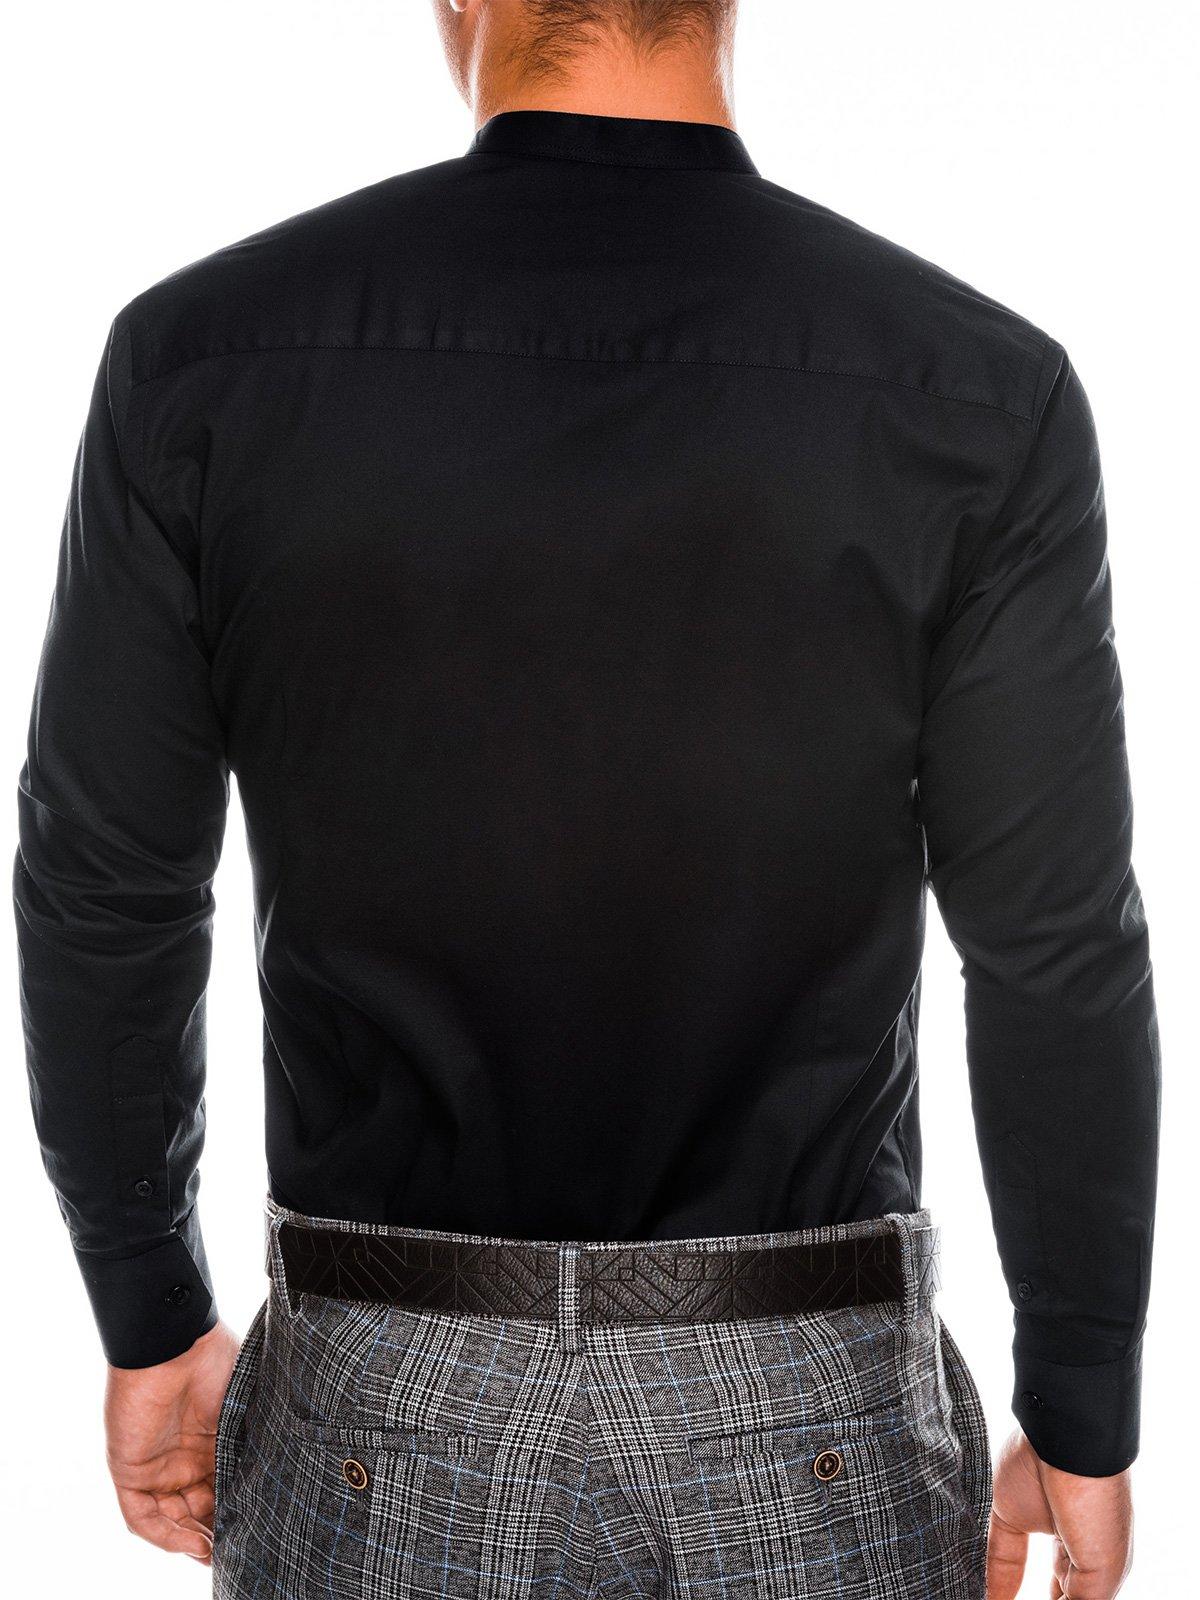 d735626d40c70 Koszula męska elegancka z długim rękawem K307 - czarna - Sklep Ombre